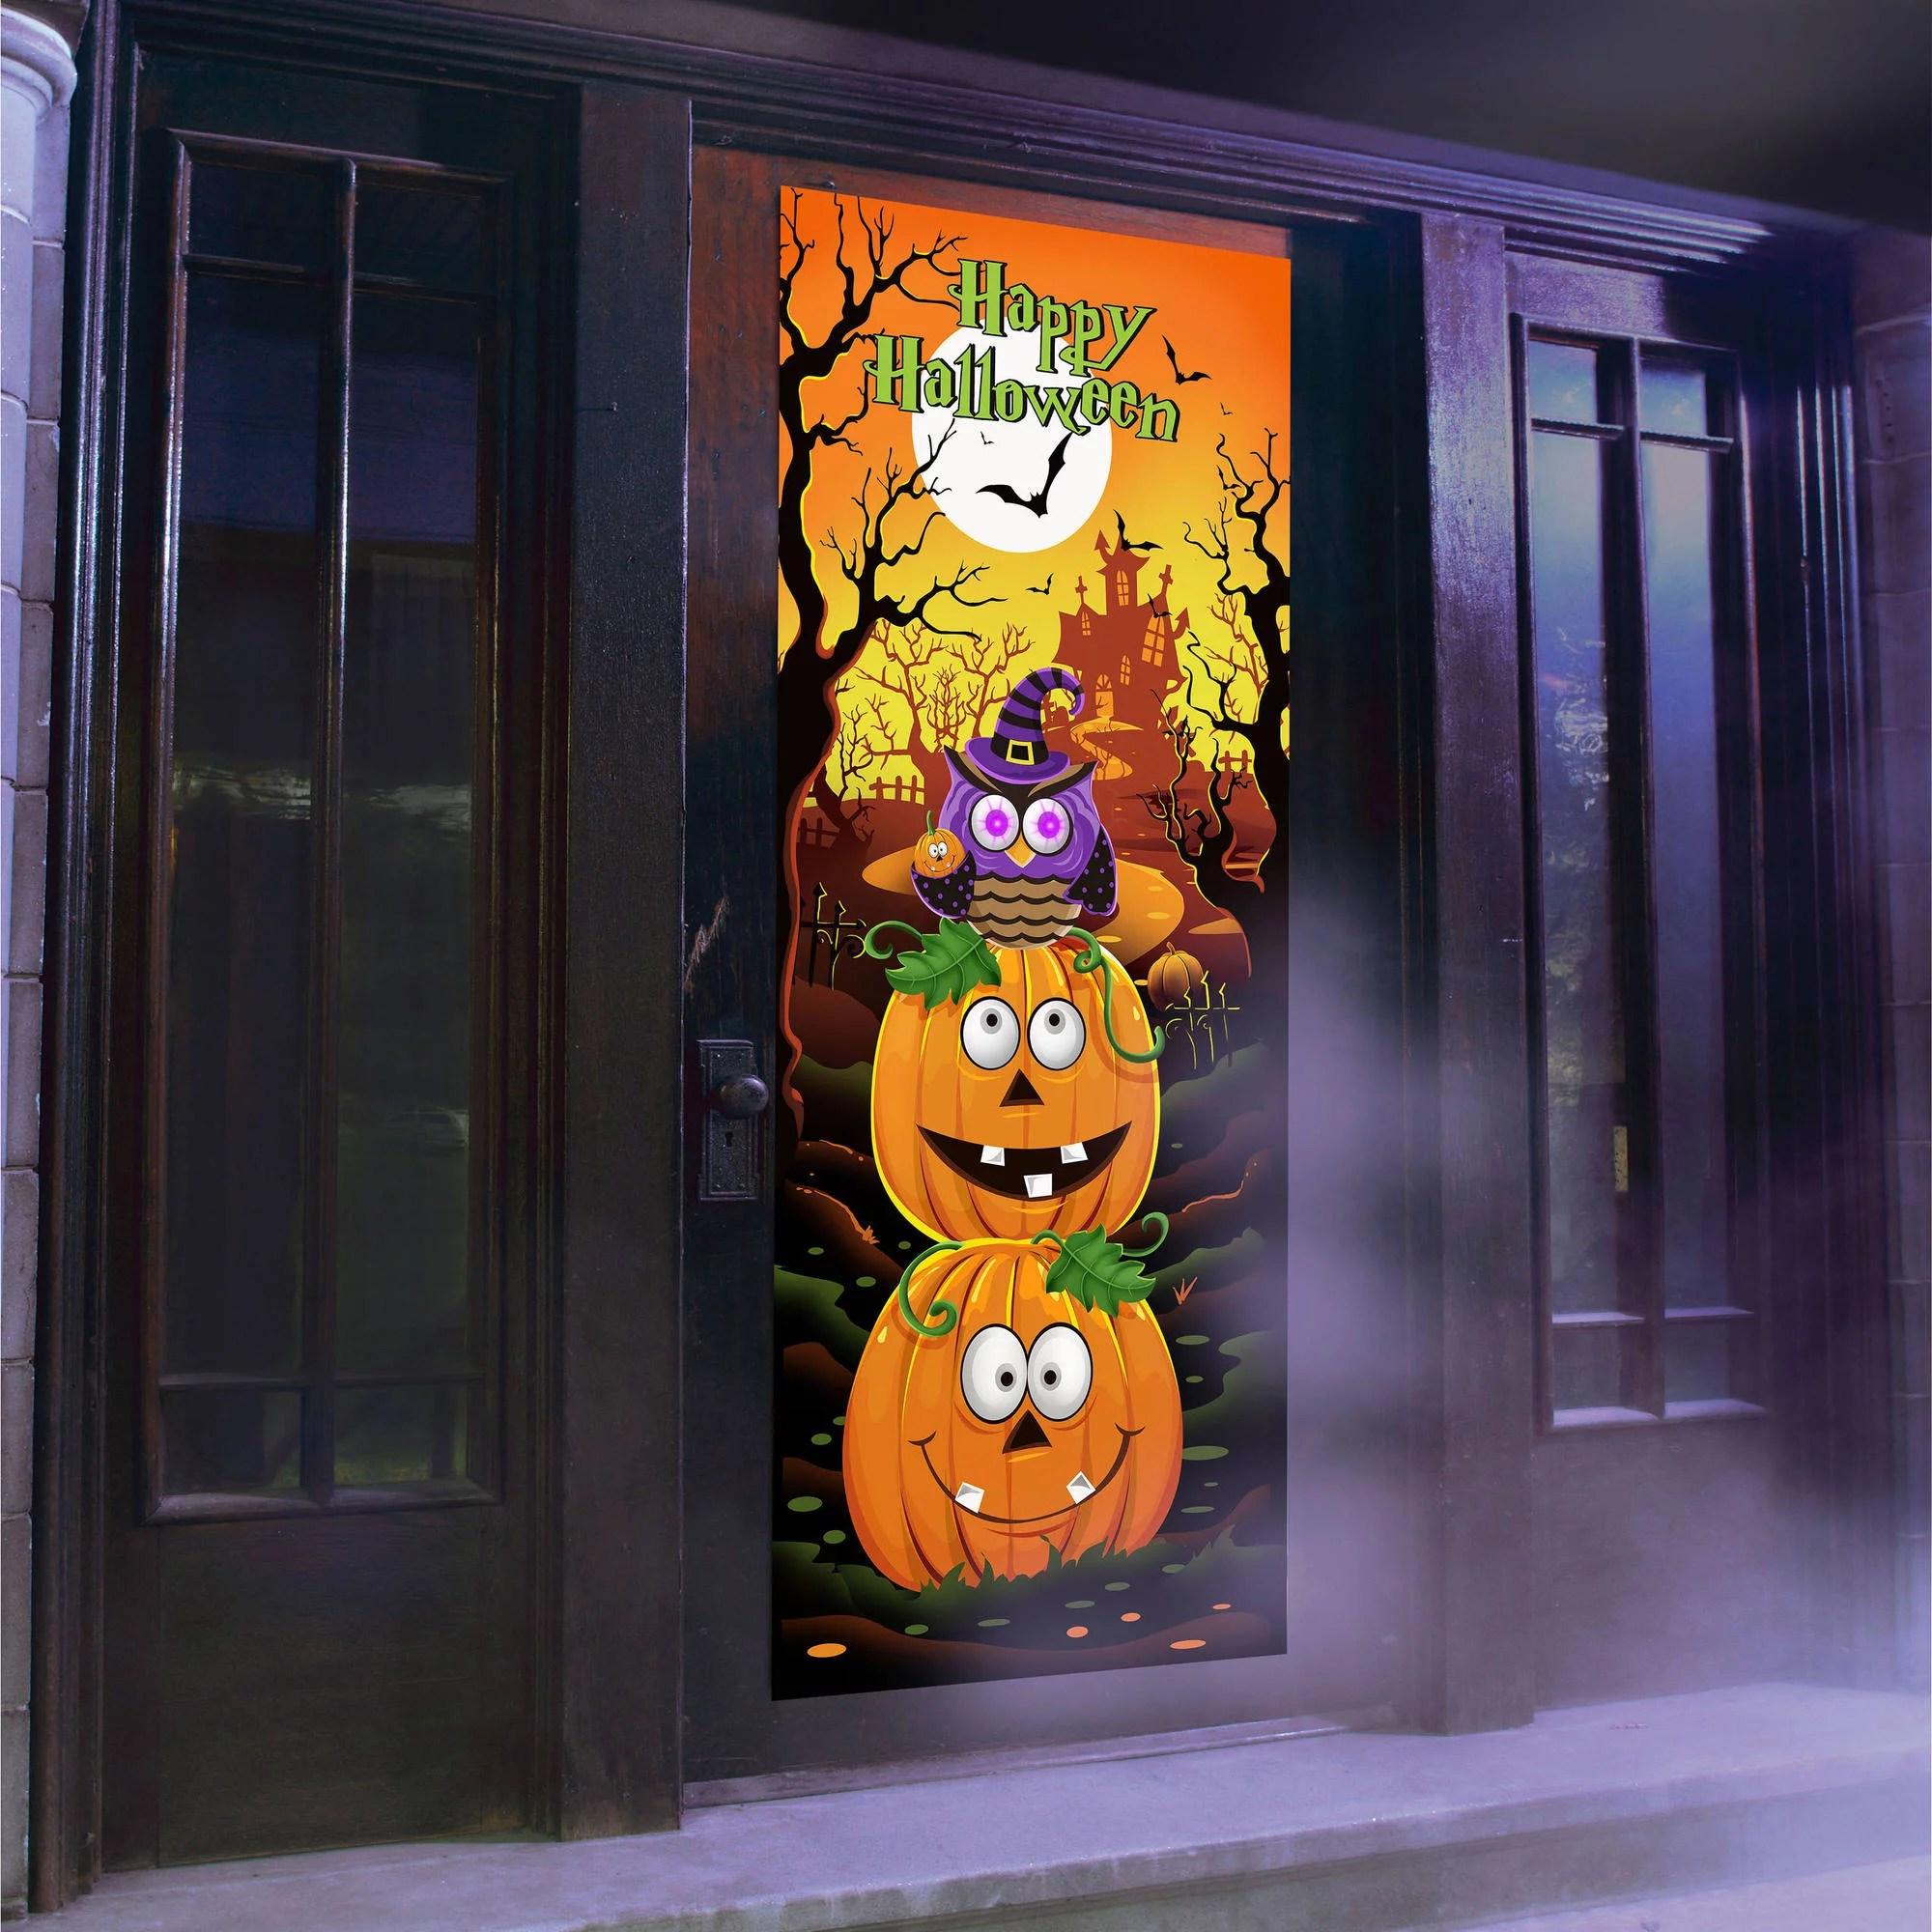 Owl Light and Sound Door Panel Halloween Decoration